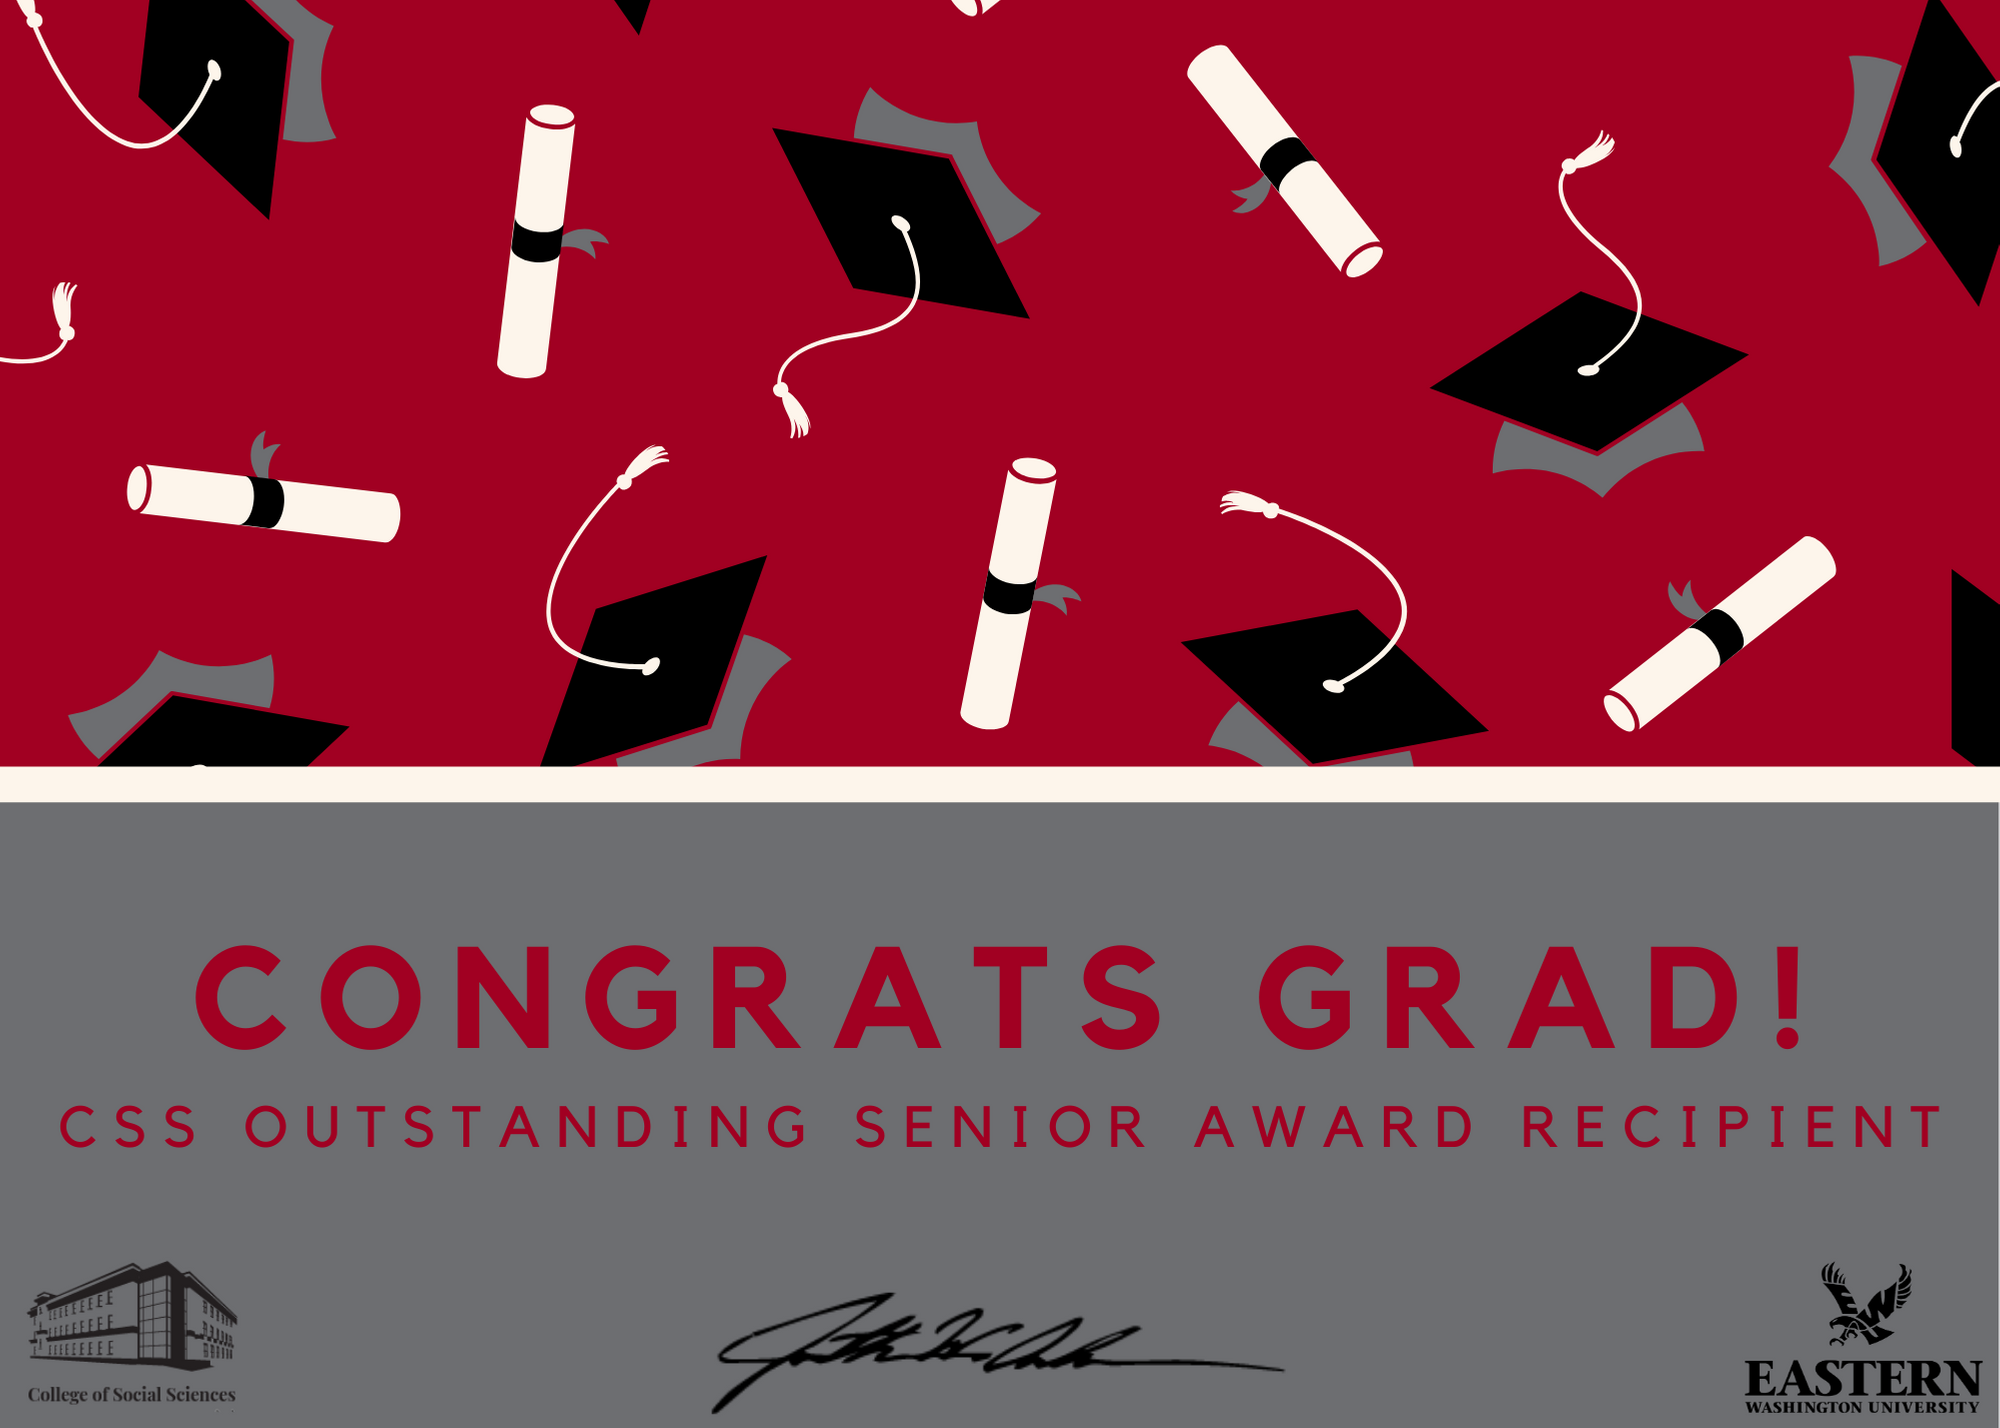 2608-caps-and-diplomas-pattern-graduation-card-2.png